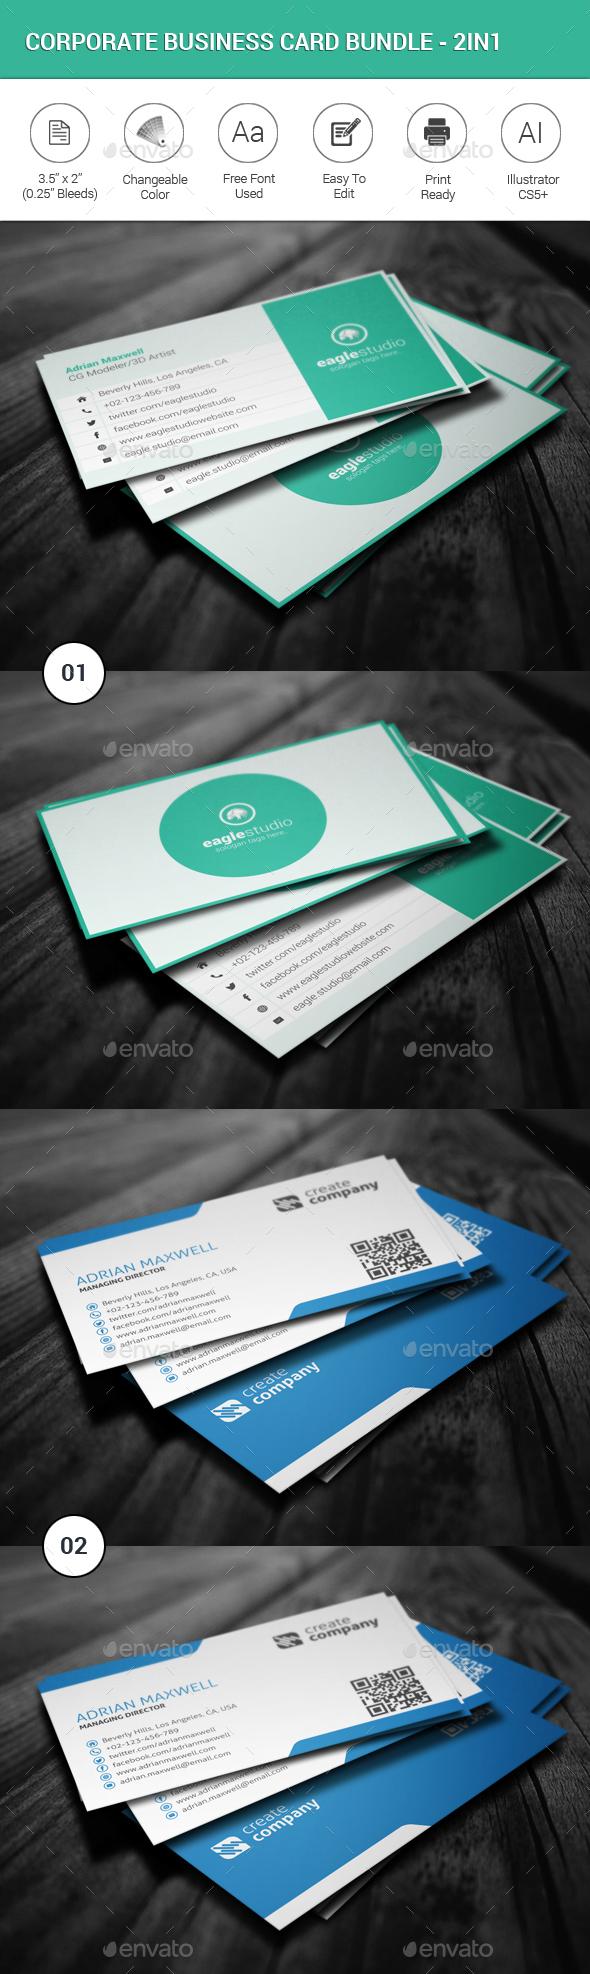 Corporate Business Card Bundle-2in1 - Corporate Business Cards